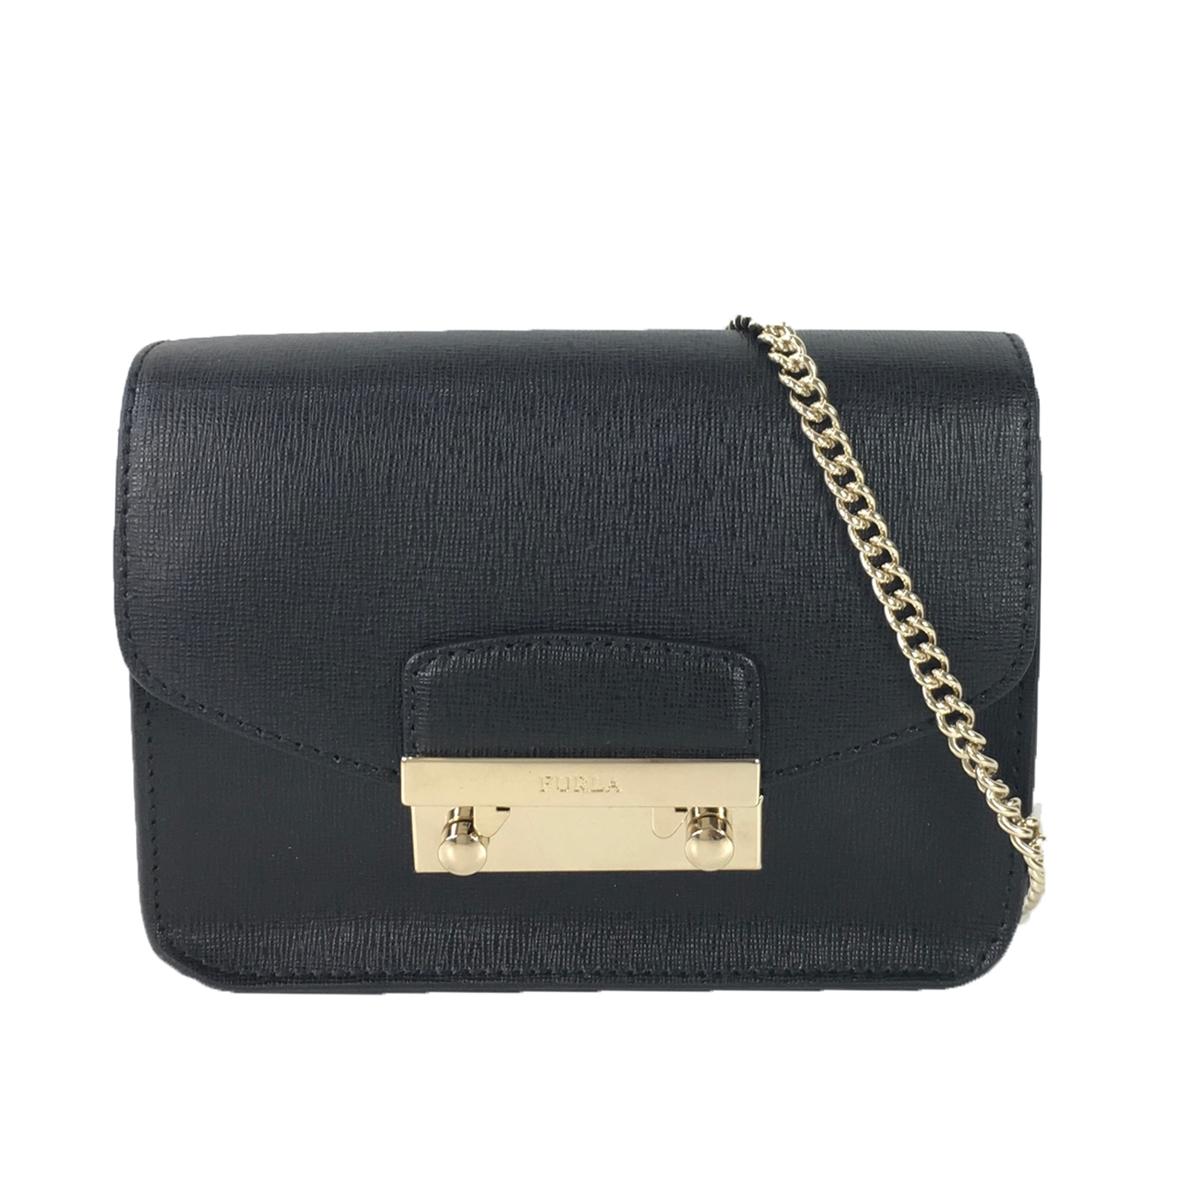 Furla Julia Saffiano Leather Mini Crossbody Bag